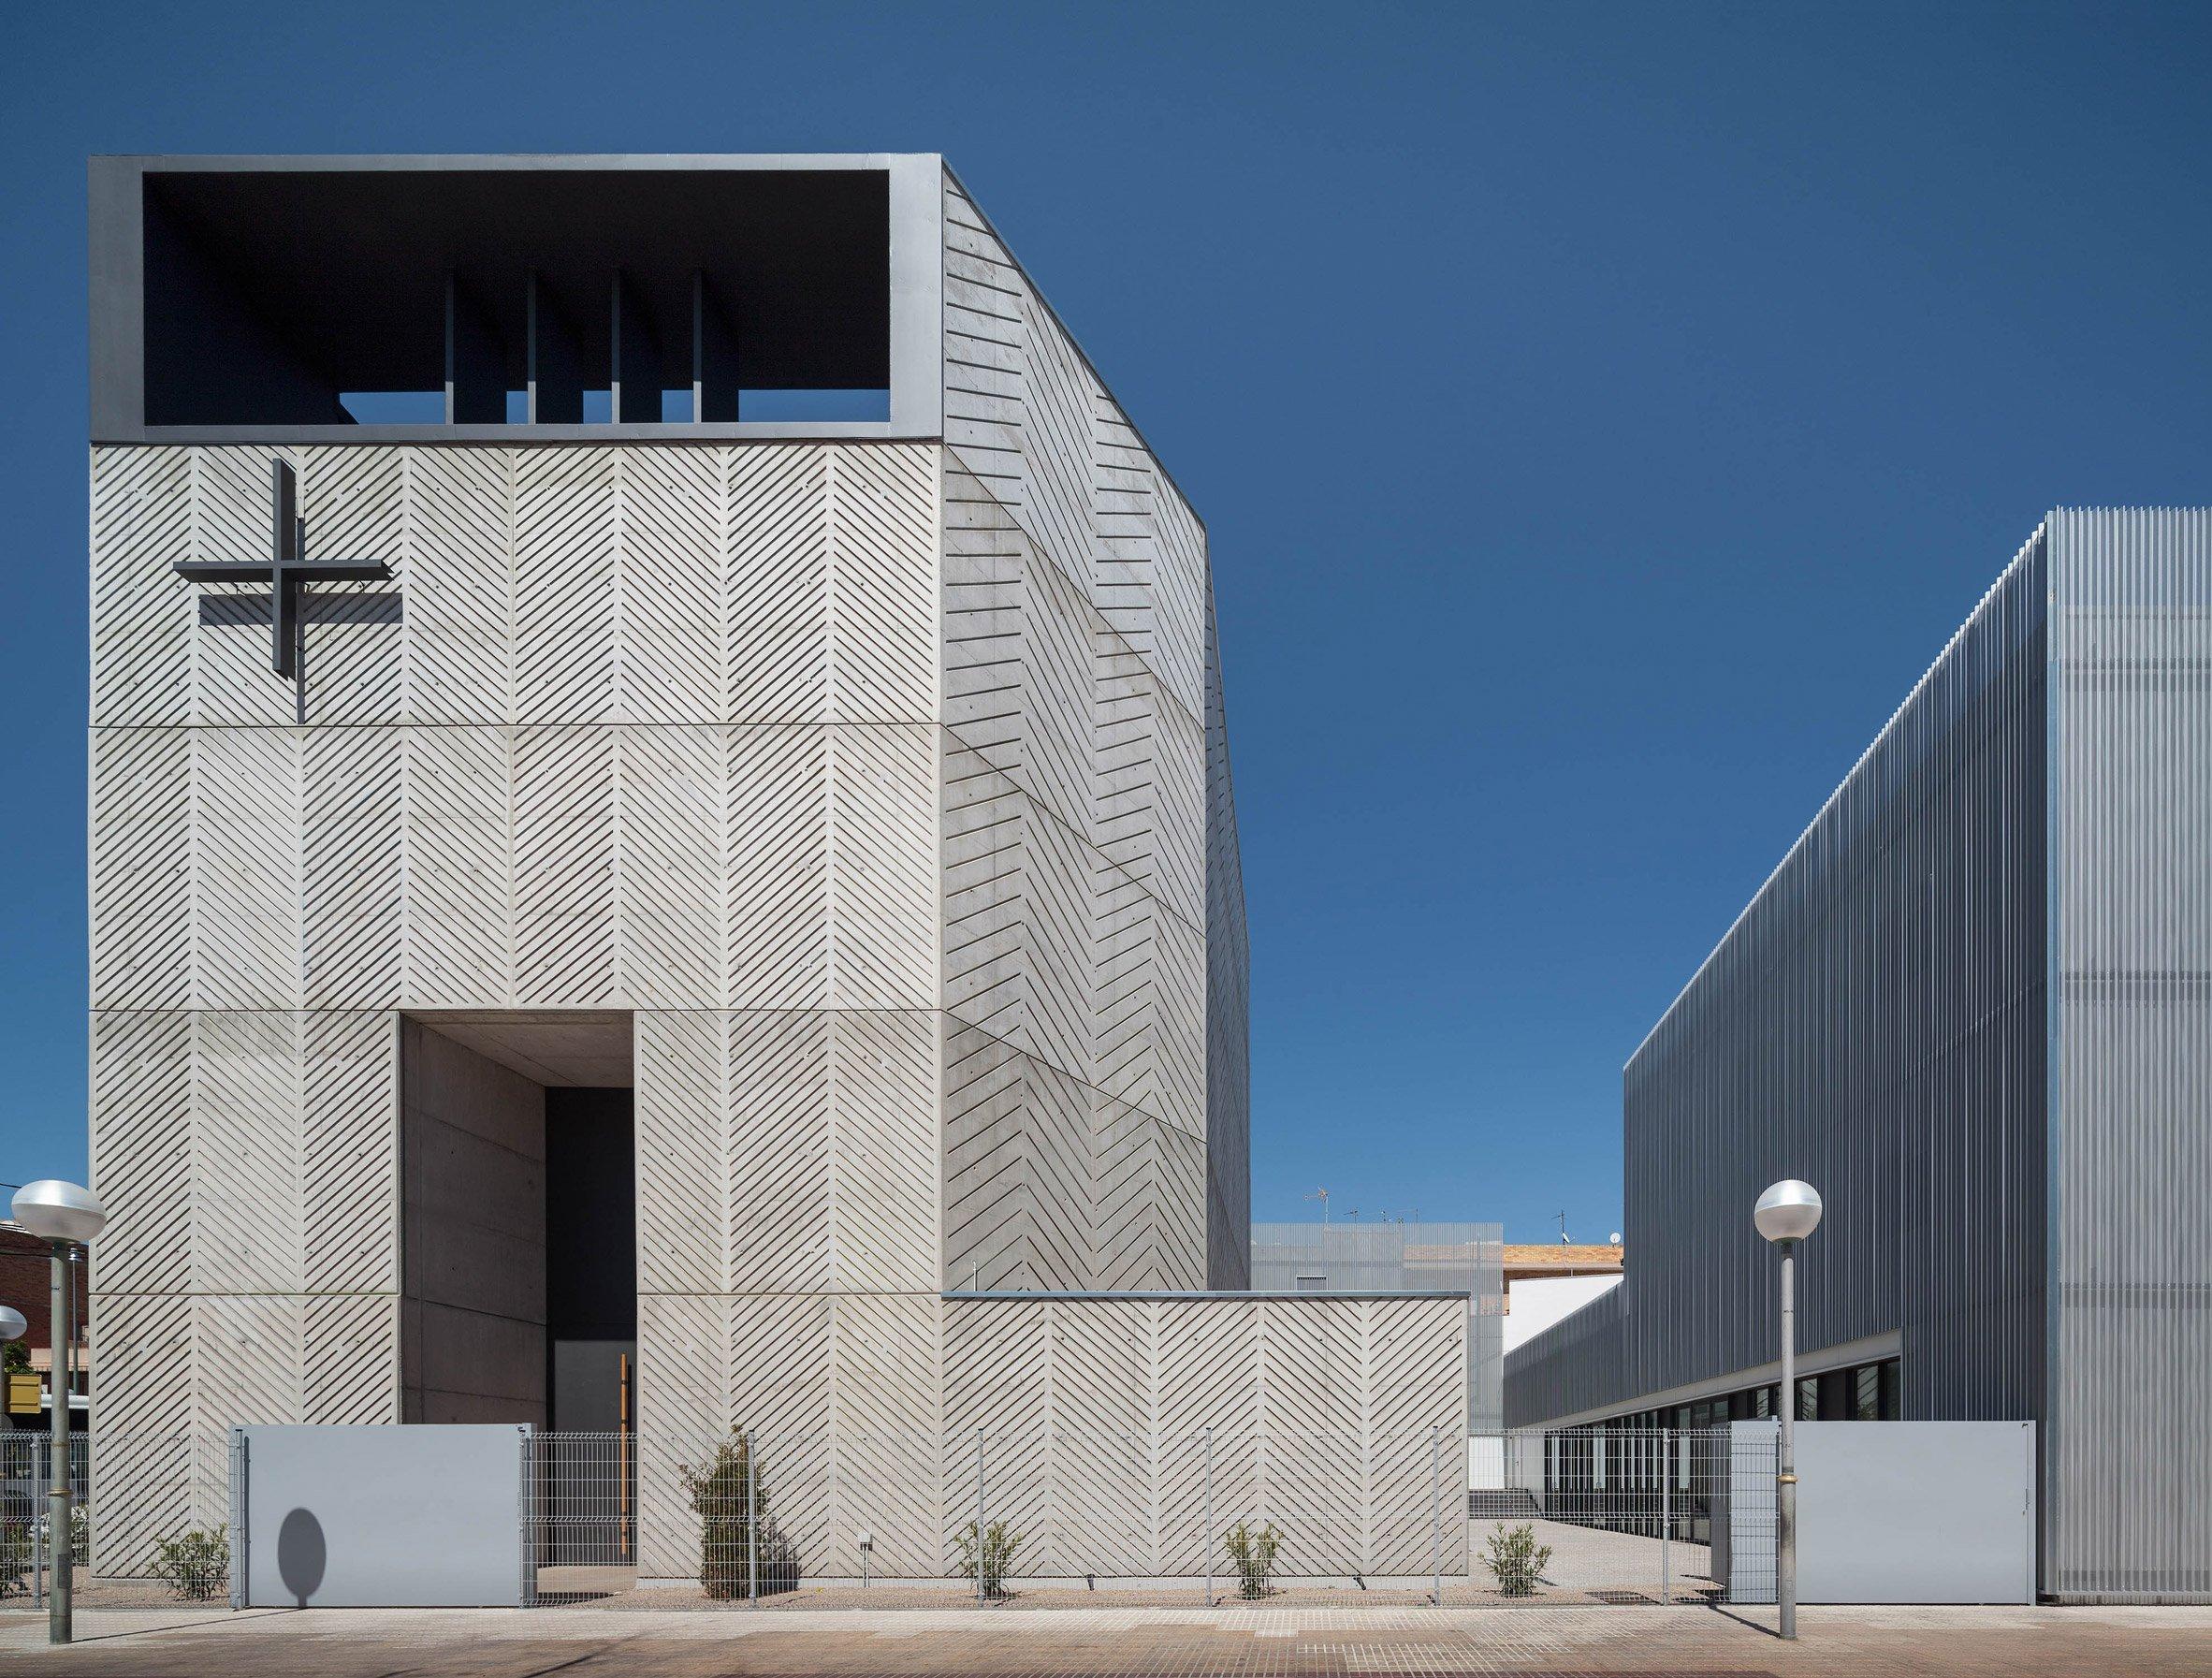 Gimeno + Guitart creates chevron-patterned concrete for church of Santa Maria Assumpta